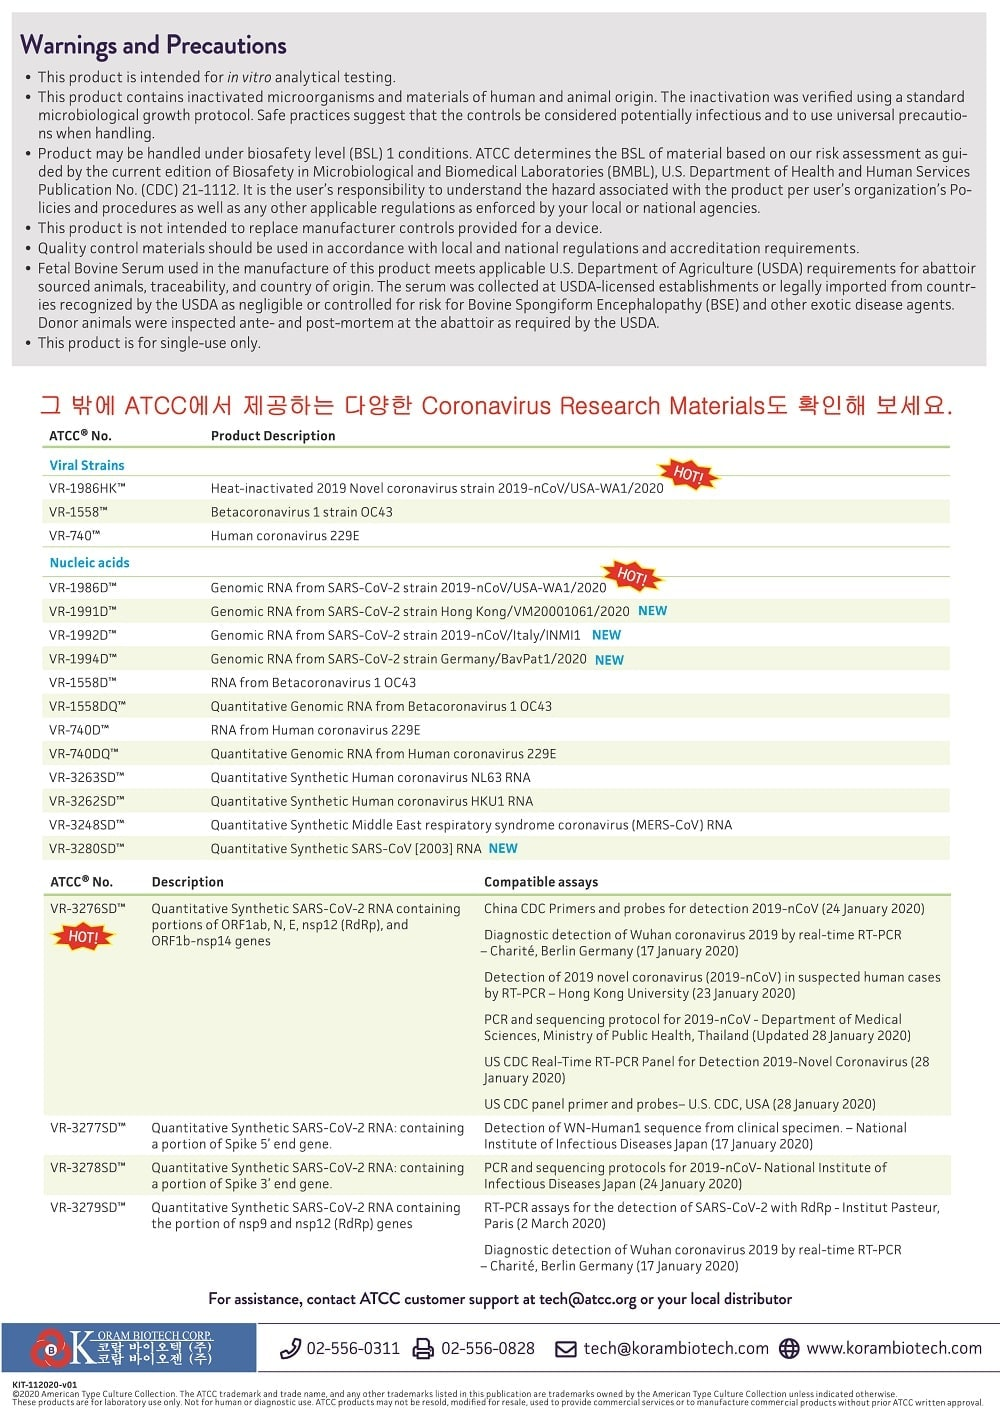 2039113258_WFEMpxvm_2021_01_MP-32_for_B8DEC0CFB3AAB6F3_CSO-B-02_resized